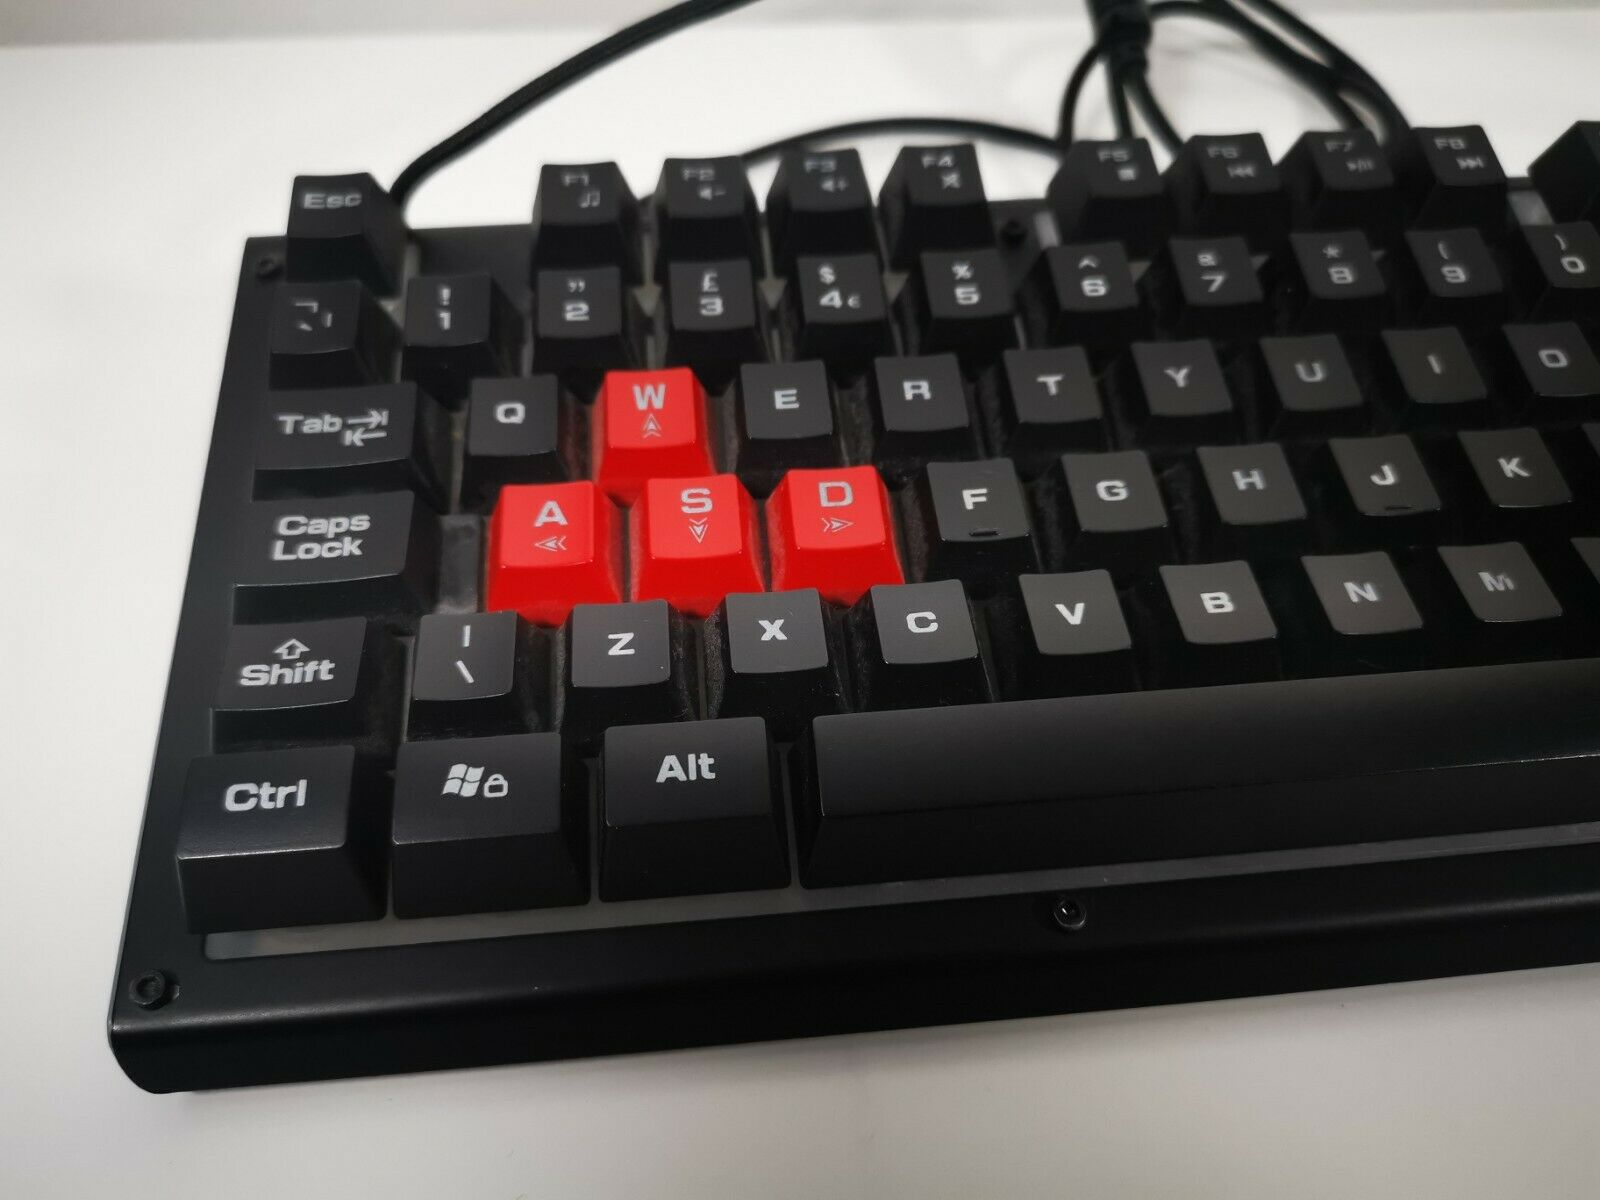 Tecknet Professional Gaming Keyboard.